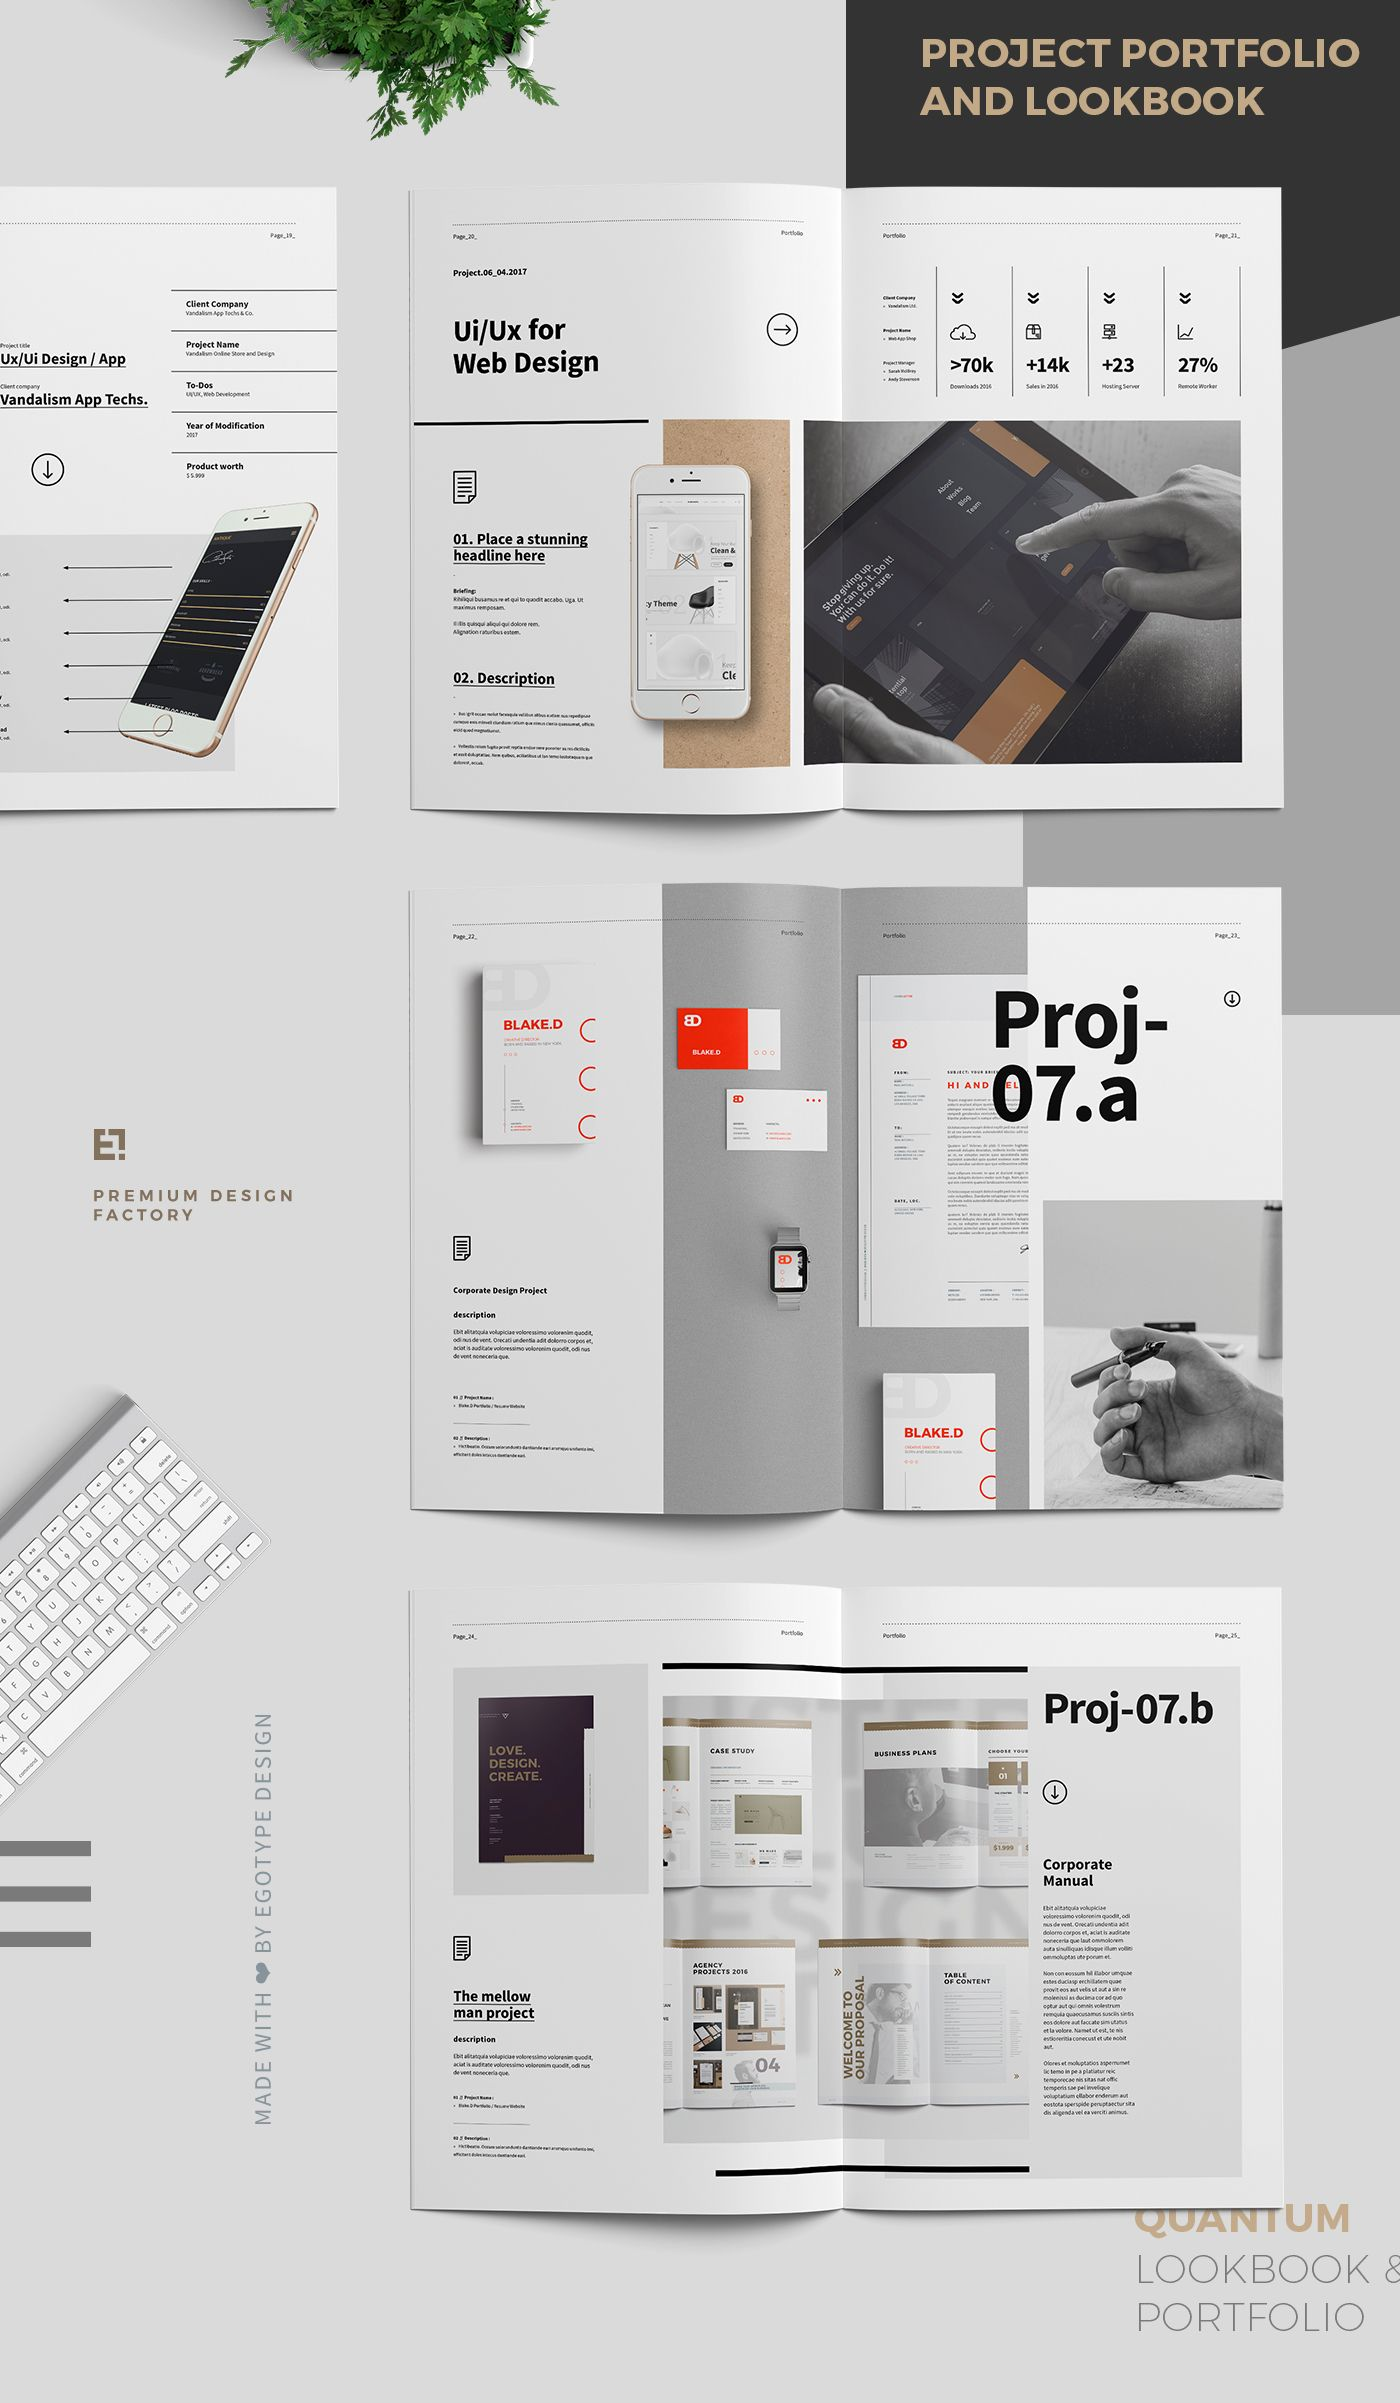 Portfolio And Project Lookbook On Behance Portfolio Web Design Graphic Designer Portfolio Portfolio Template Design